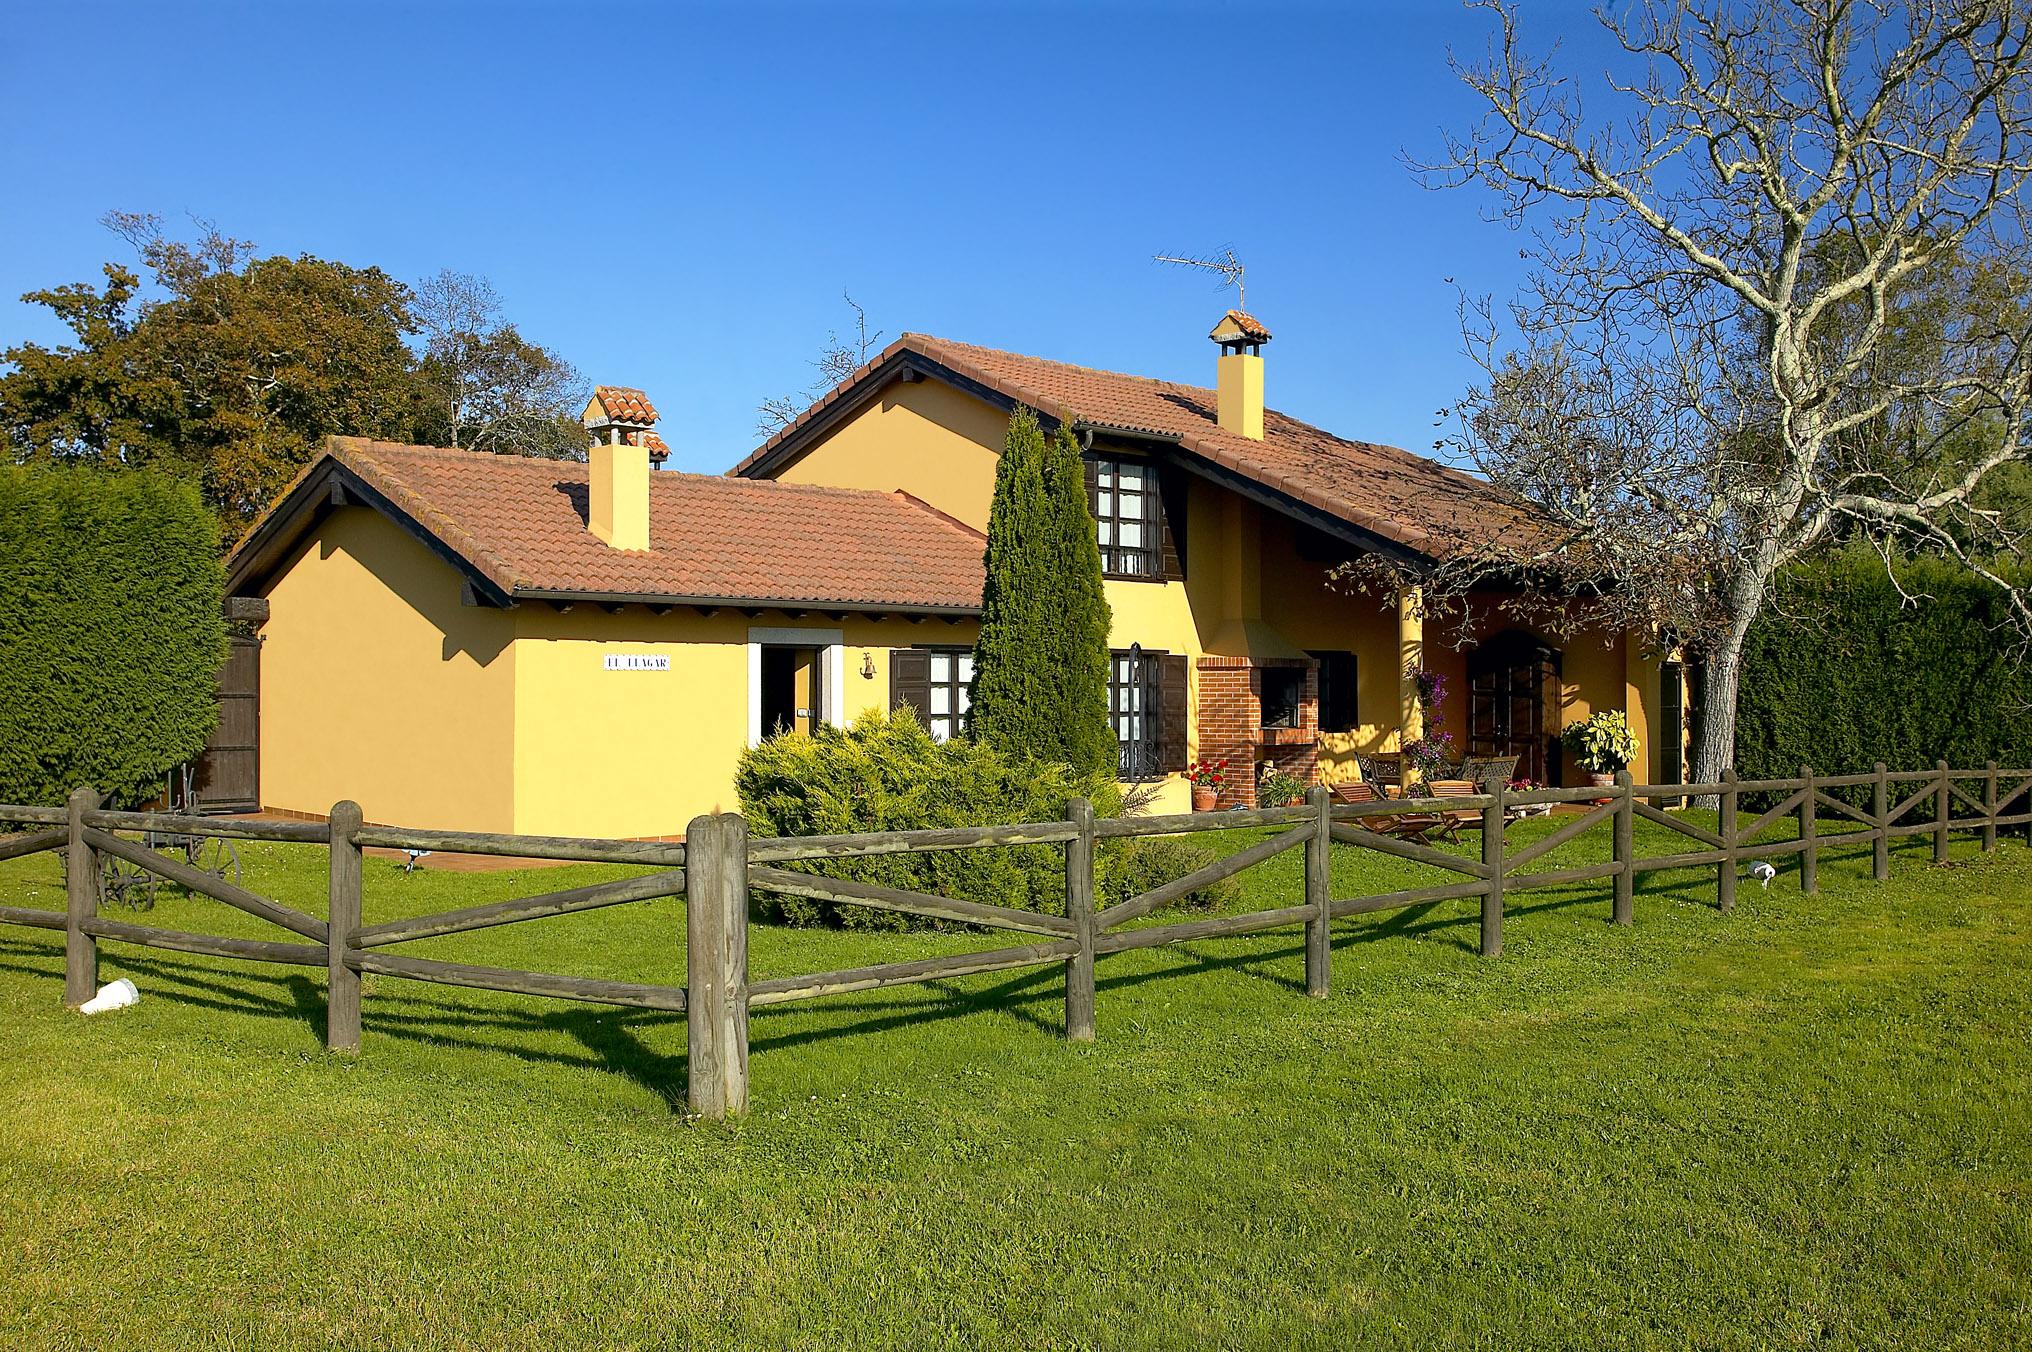 C. Aldea Casa Rosaura